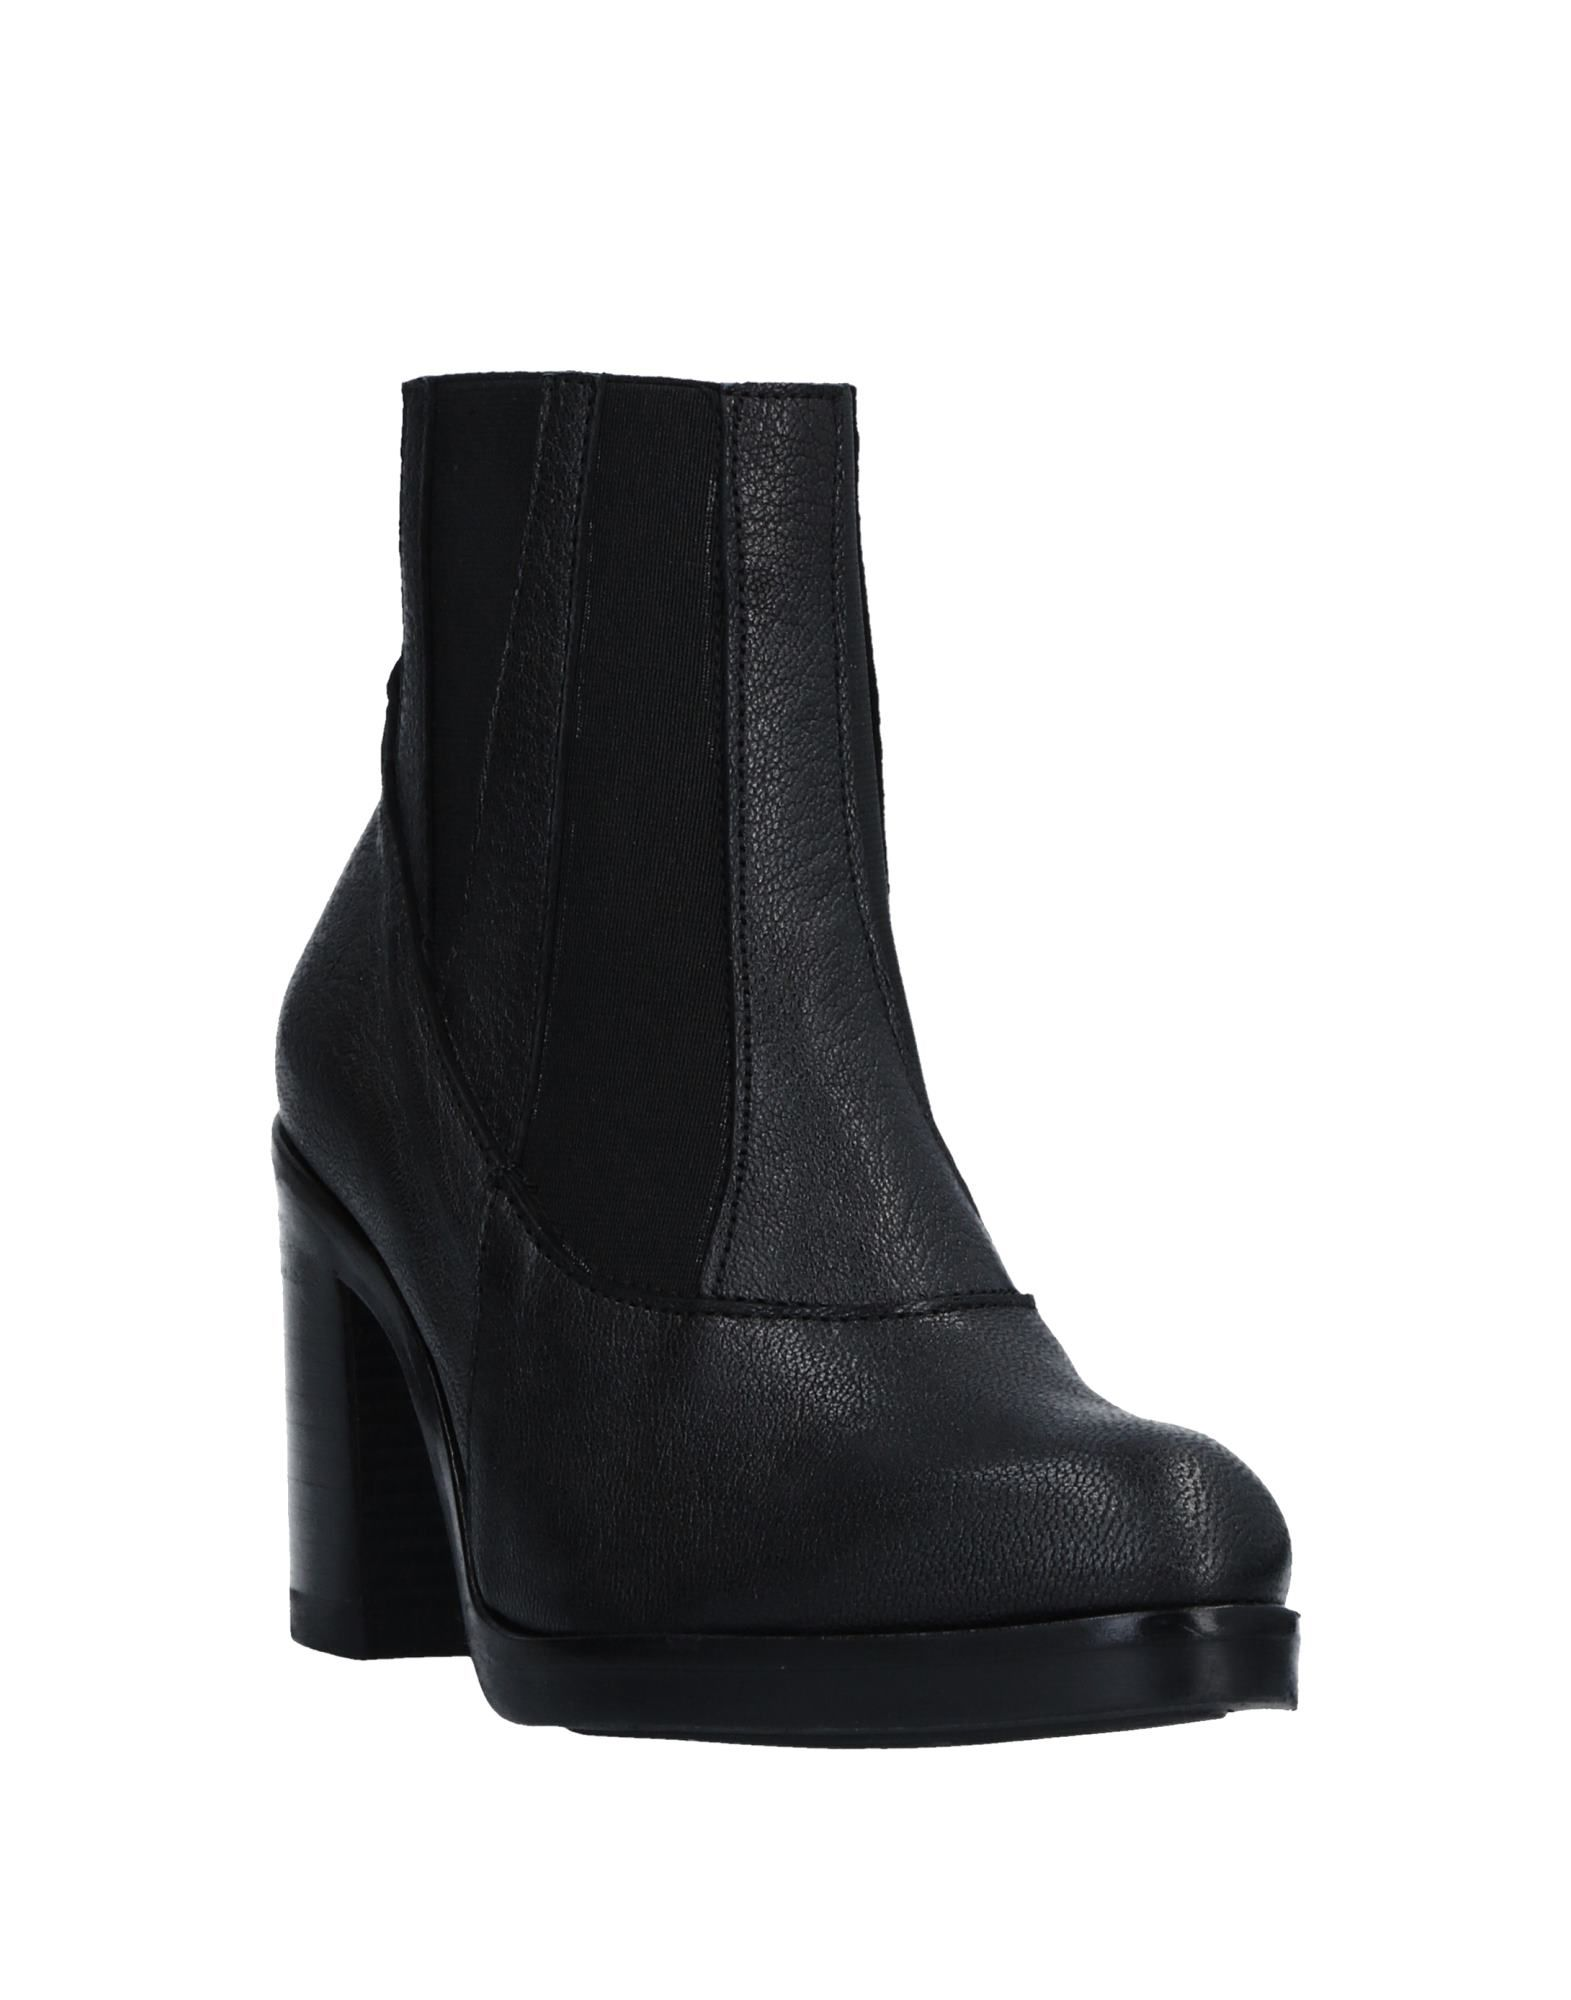 Lilimill 11522389PX Stiefelette Damen 11522389PX Lilimill Gute Qualität beliebte Schuhe 612bcd